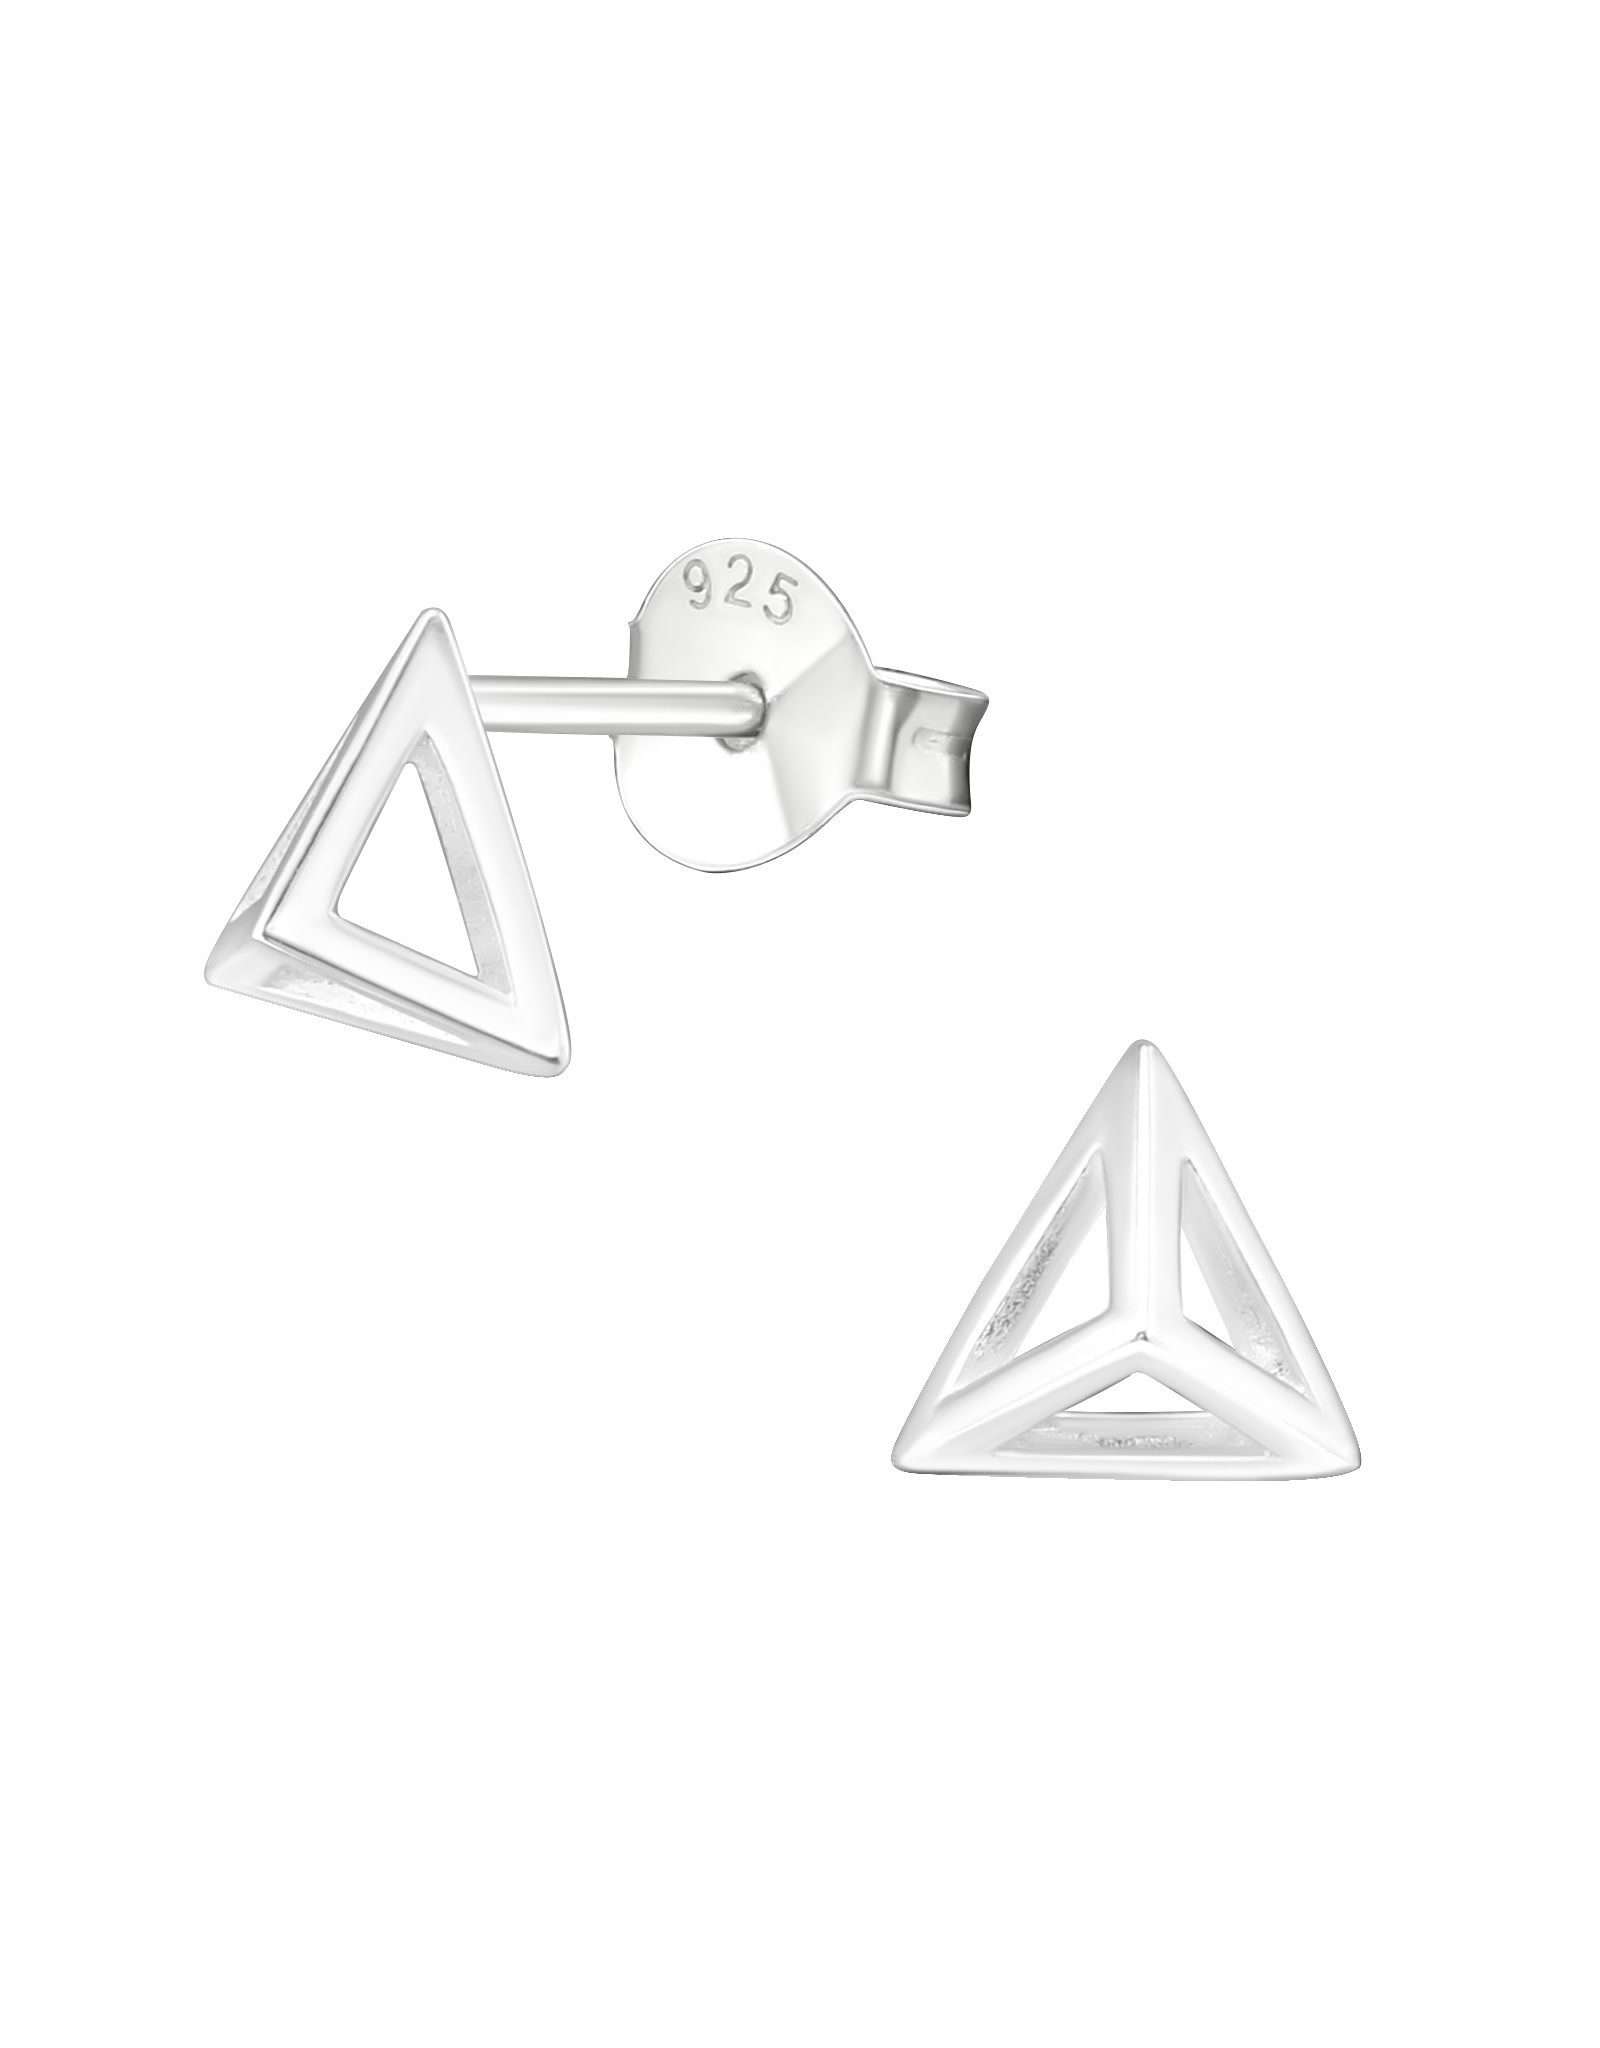 Stekertjes zilver piramide